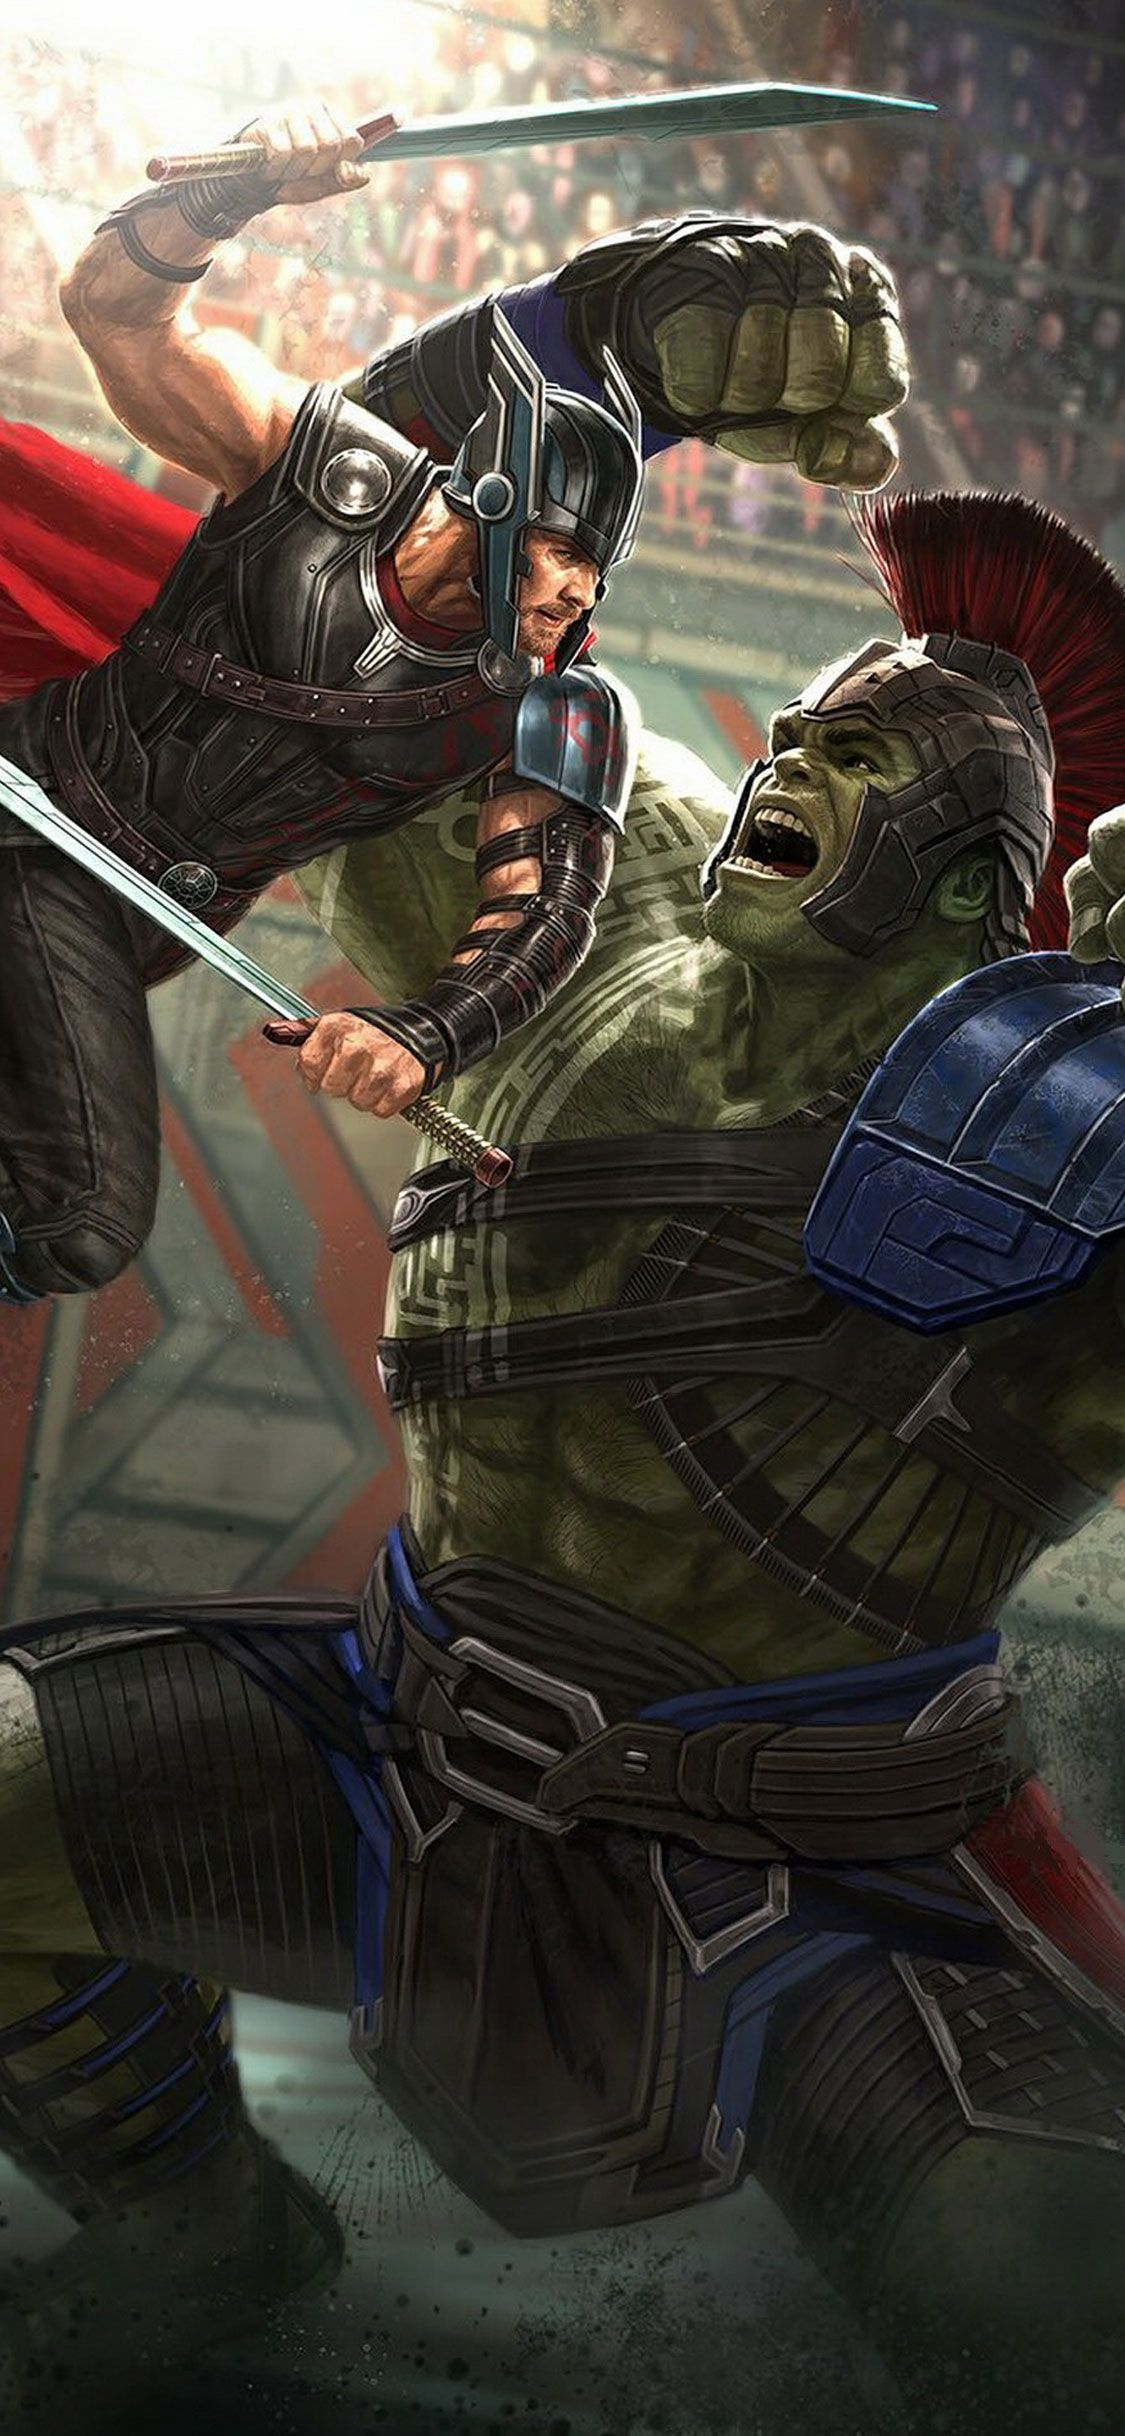 Hulk Iphone Hd Wallpapers Top Free Hulk Iphone Hd Backgrounds